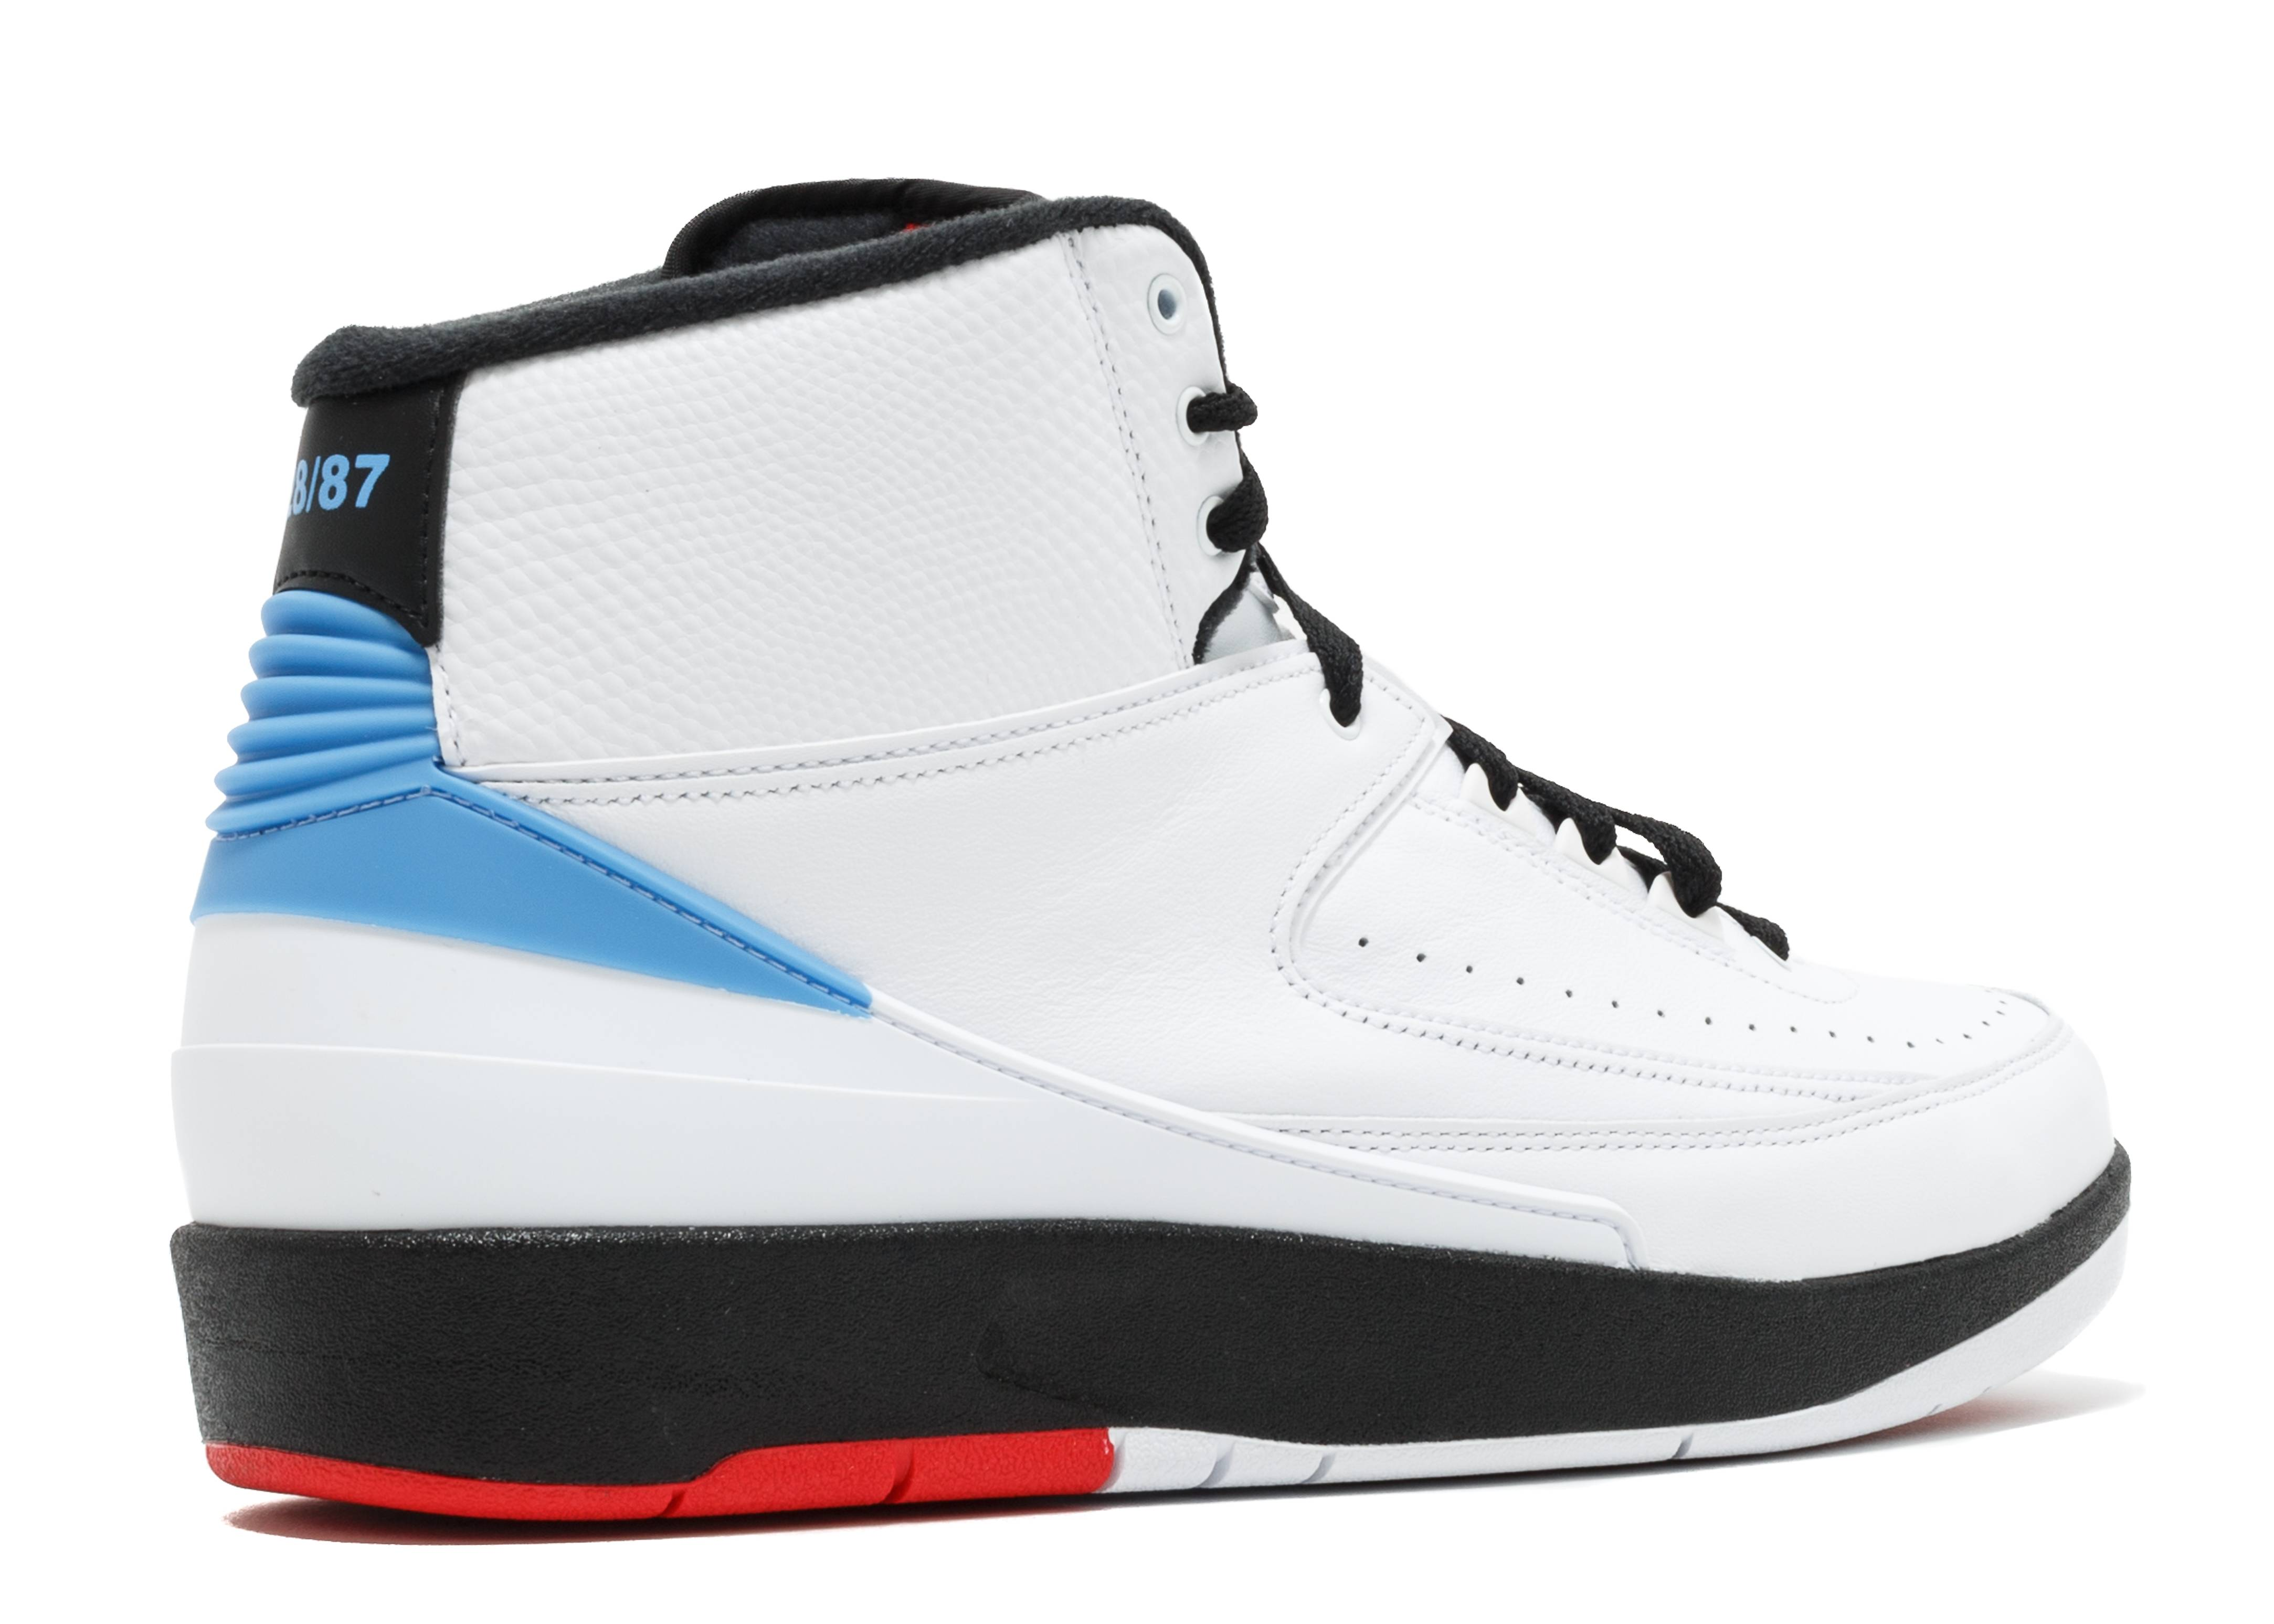 566eab583d7d Jordan X Converse Pack - Nike - 917931 900 - multi-color multi-color ...